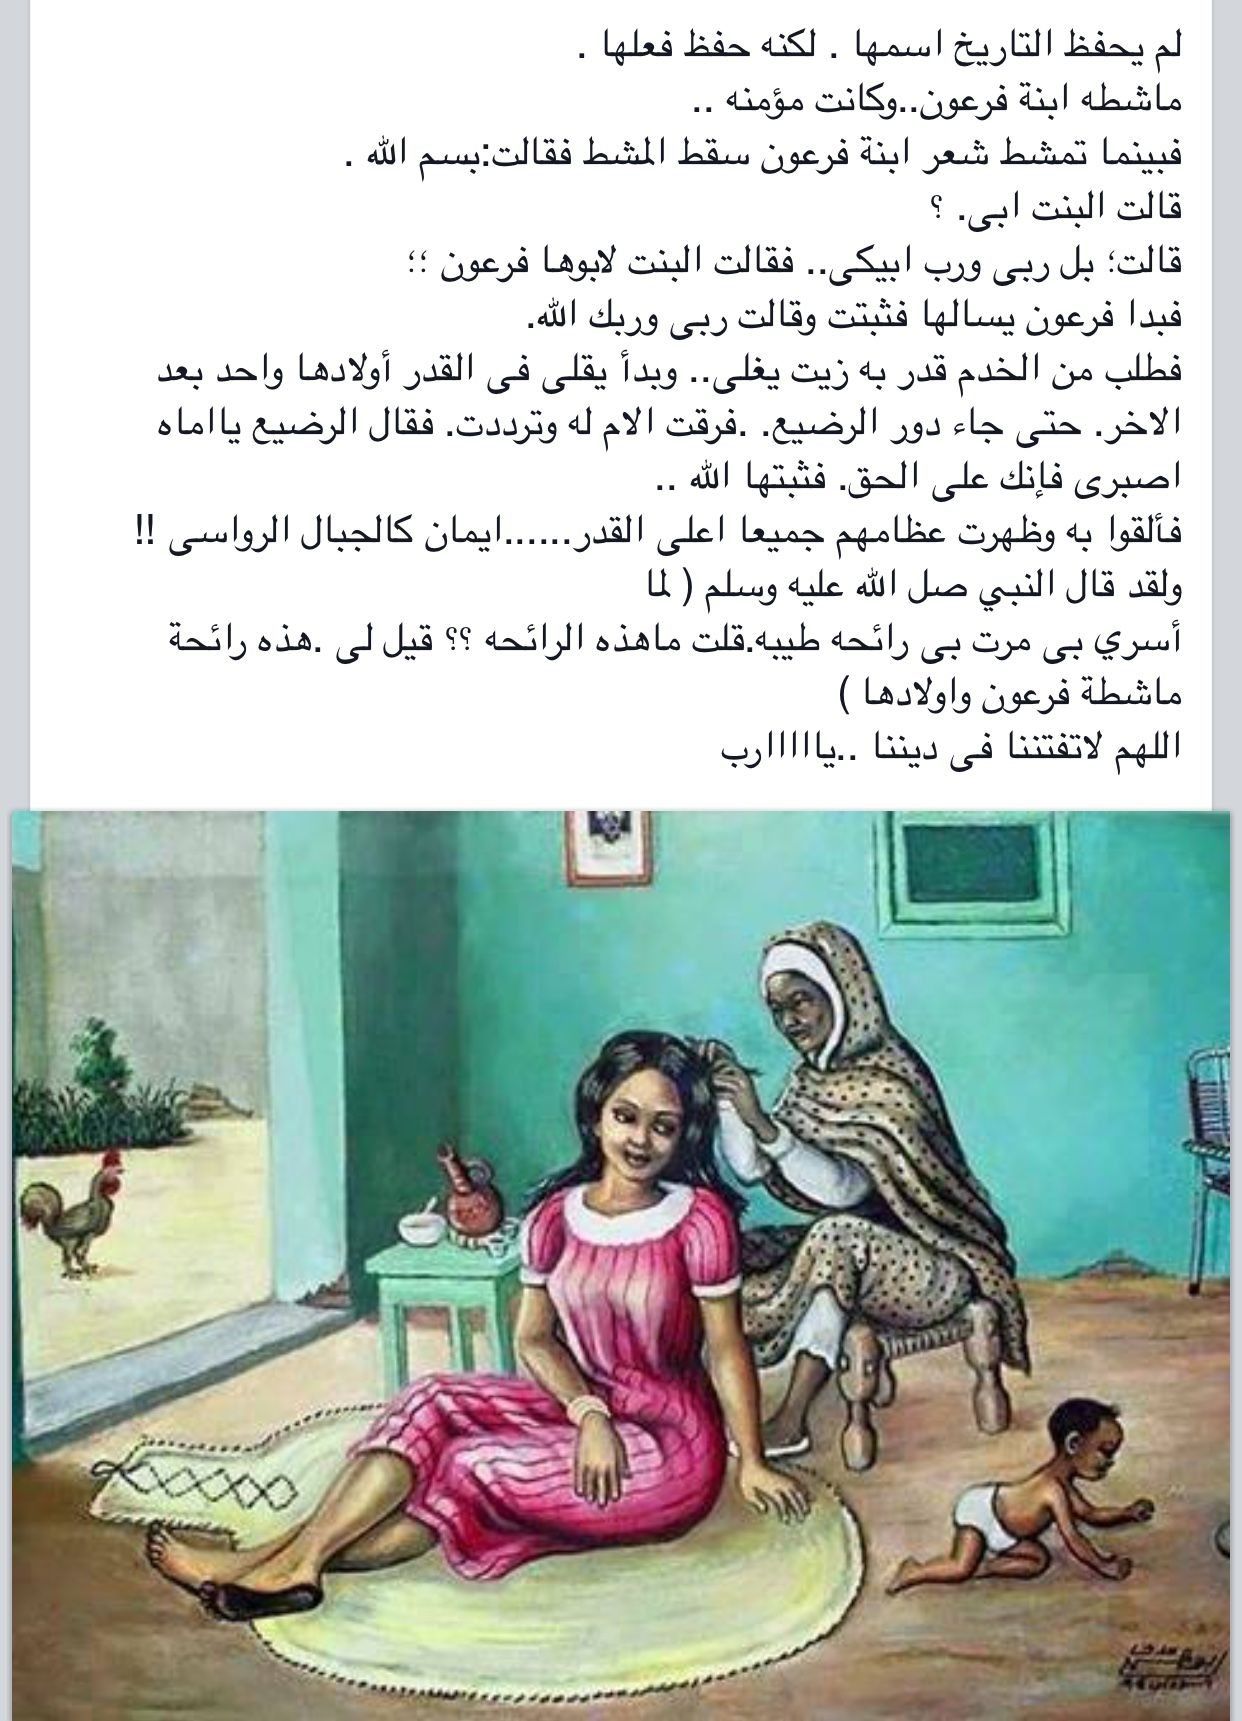 Pin by Queen MōōN on الحمدالله علي نعمة alislam Arabic